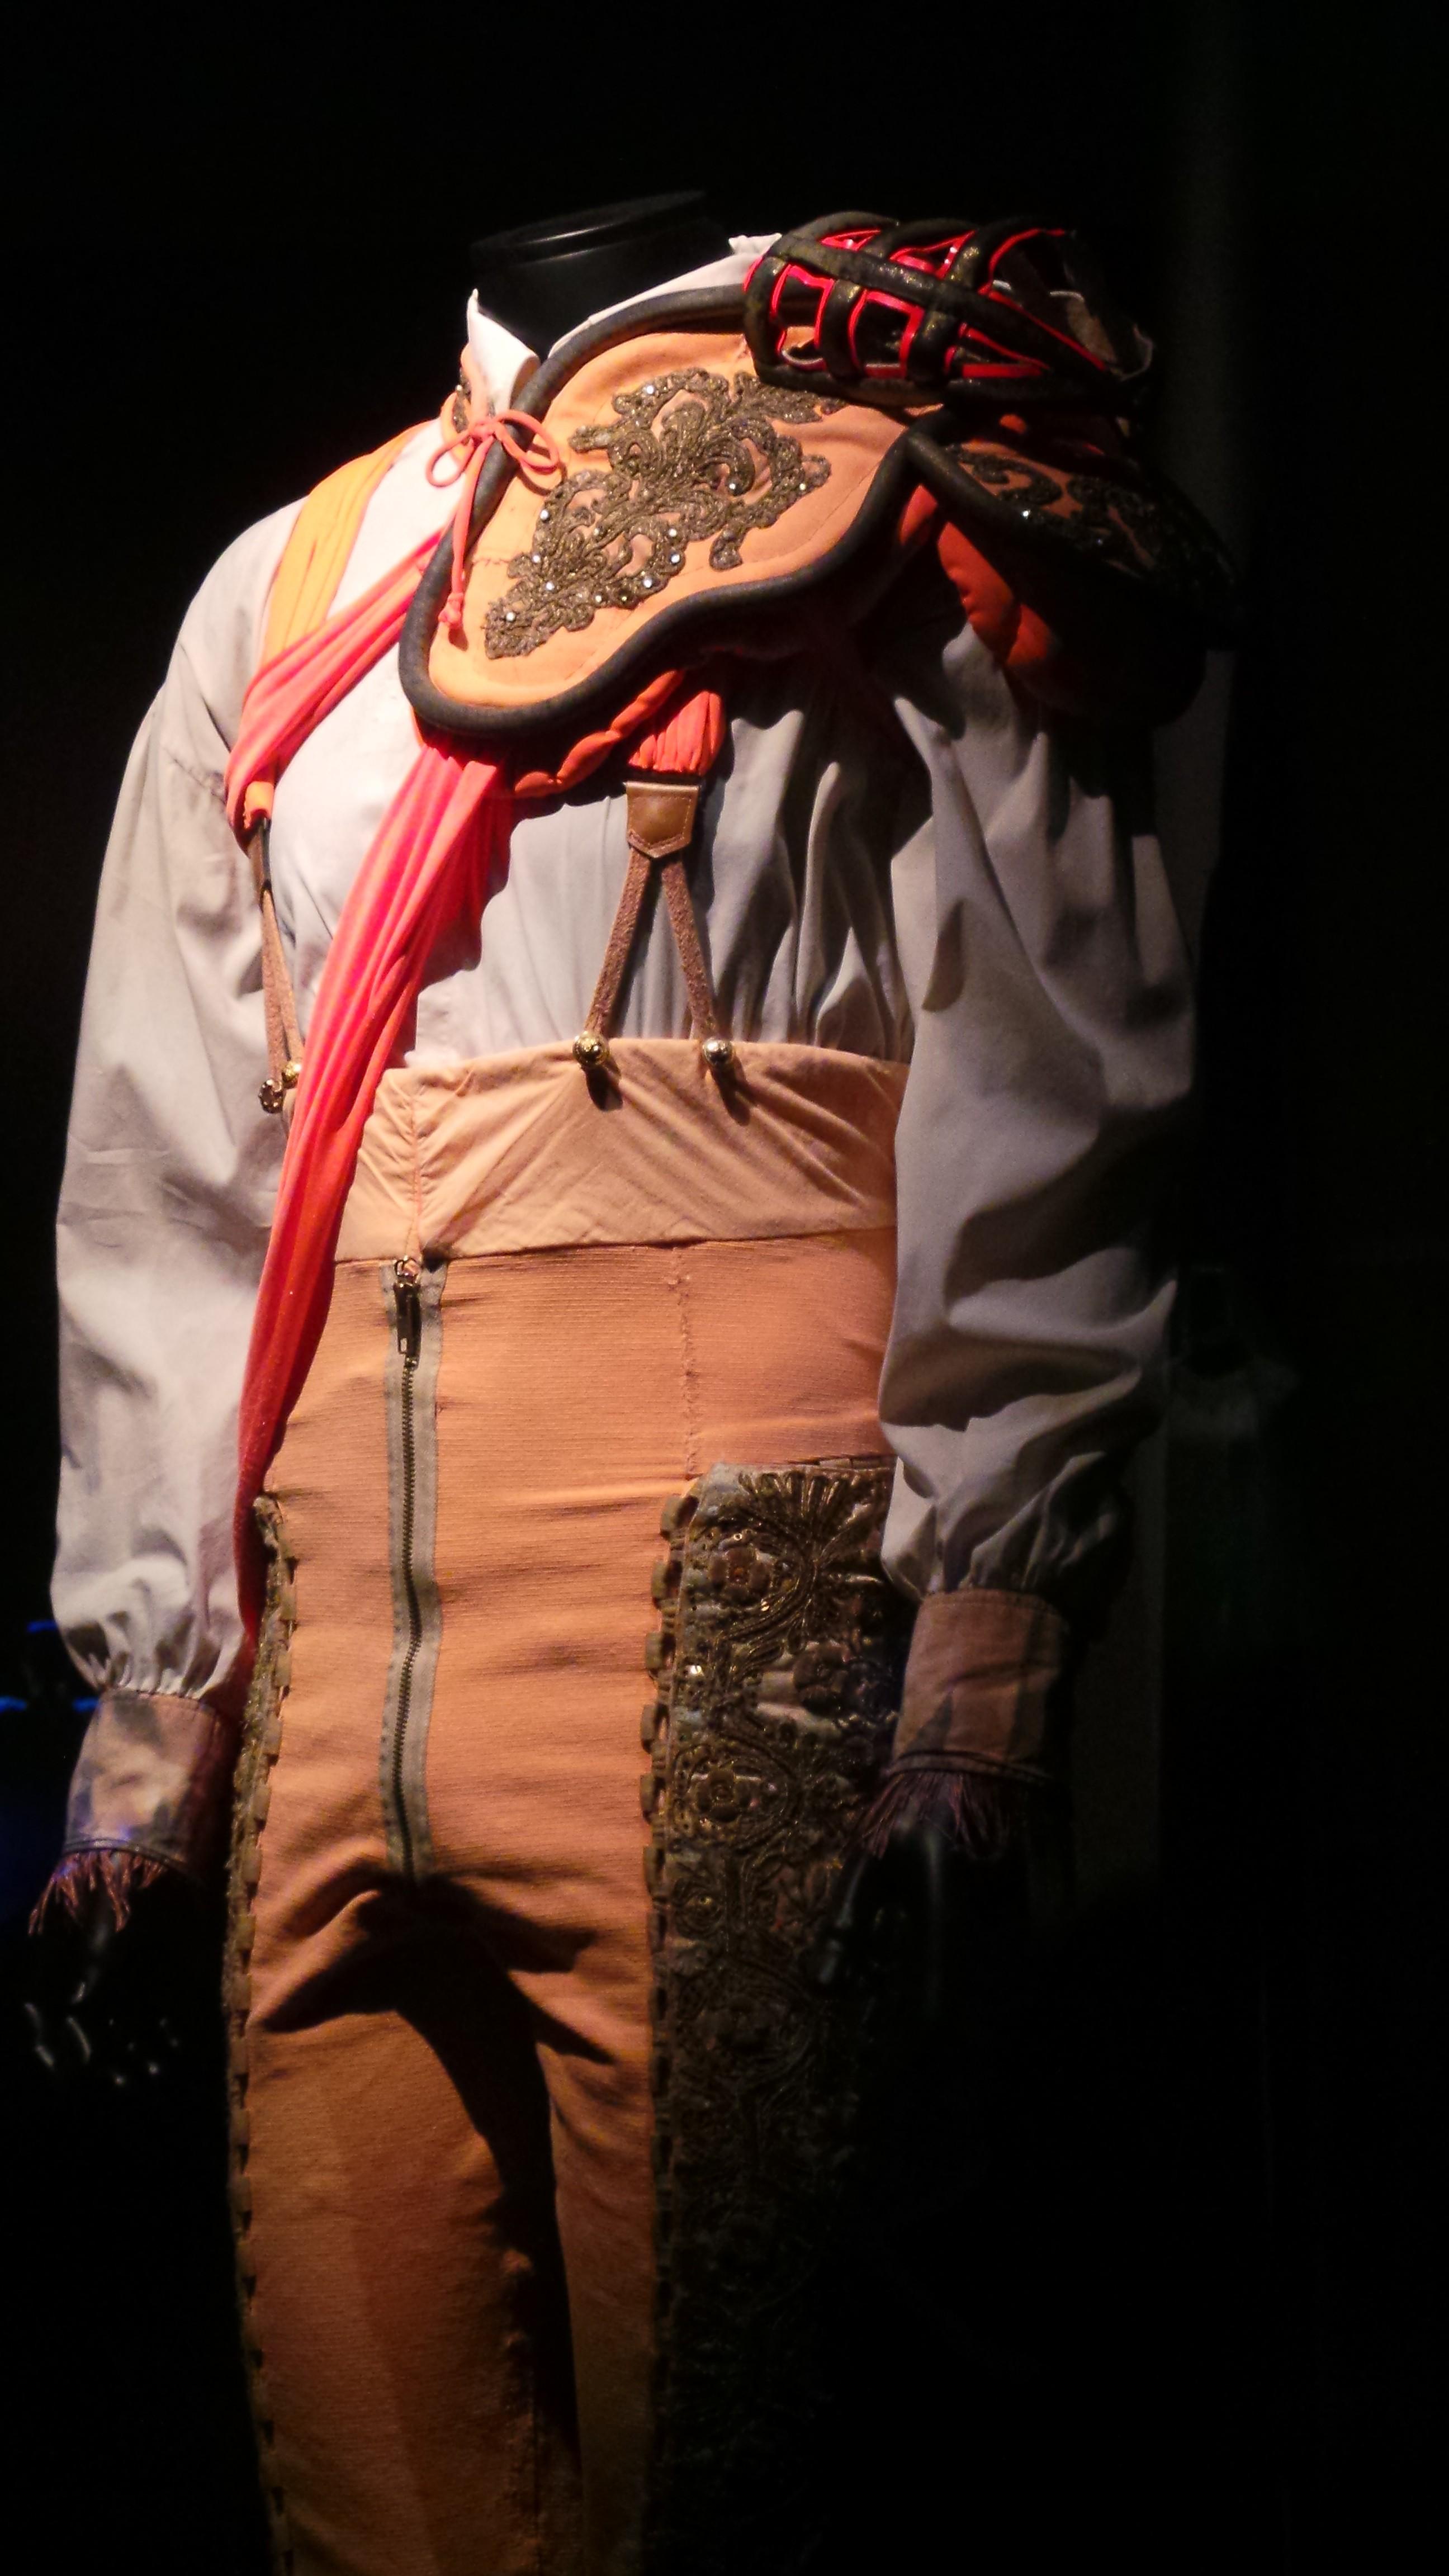 20151002_125359 - Exposition Angelin Preljocaj CNCS Moulins 2015 Costumes de danse